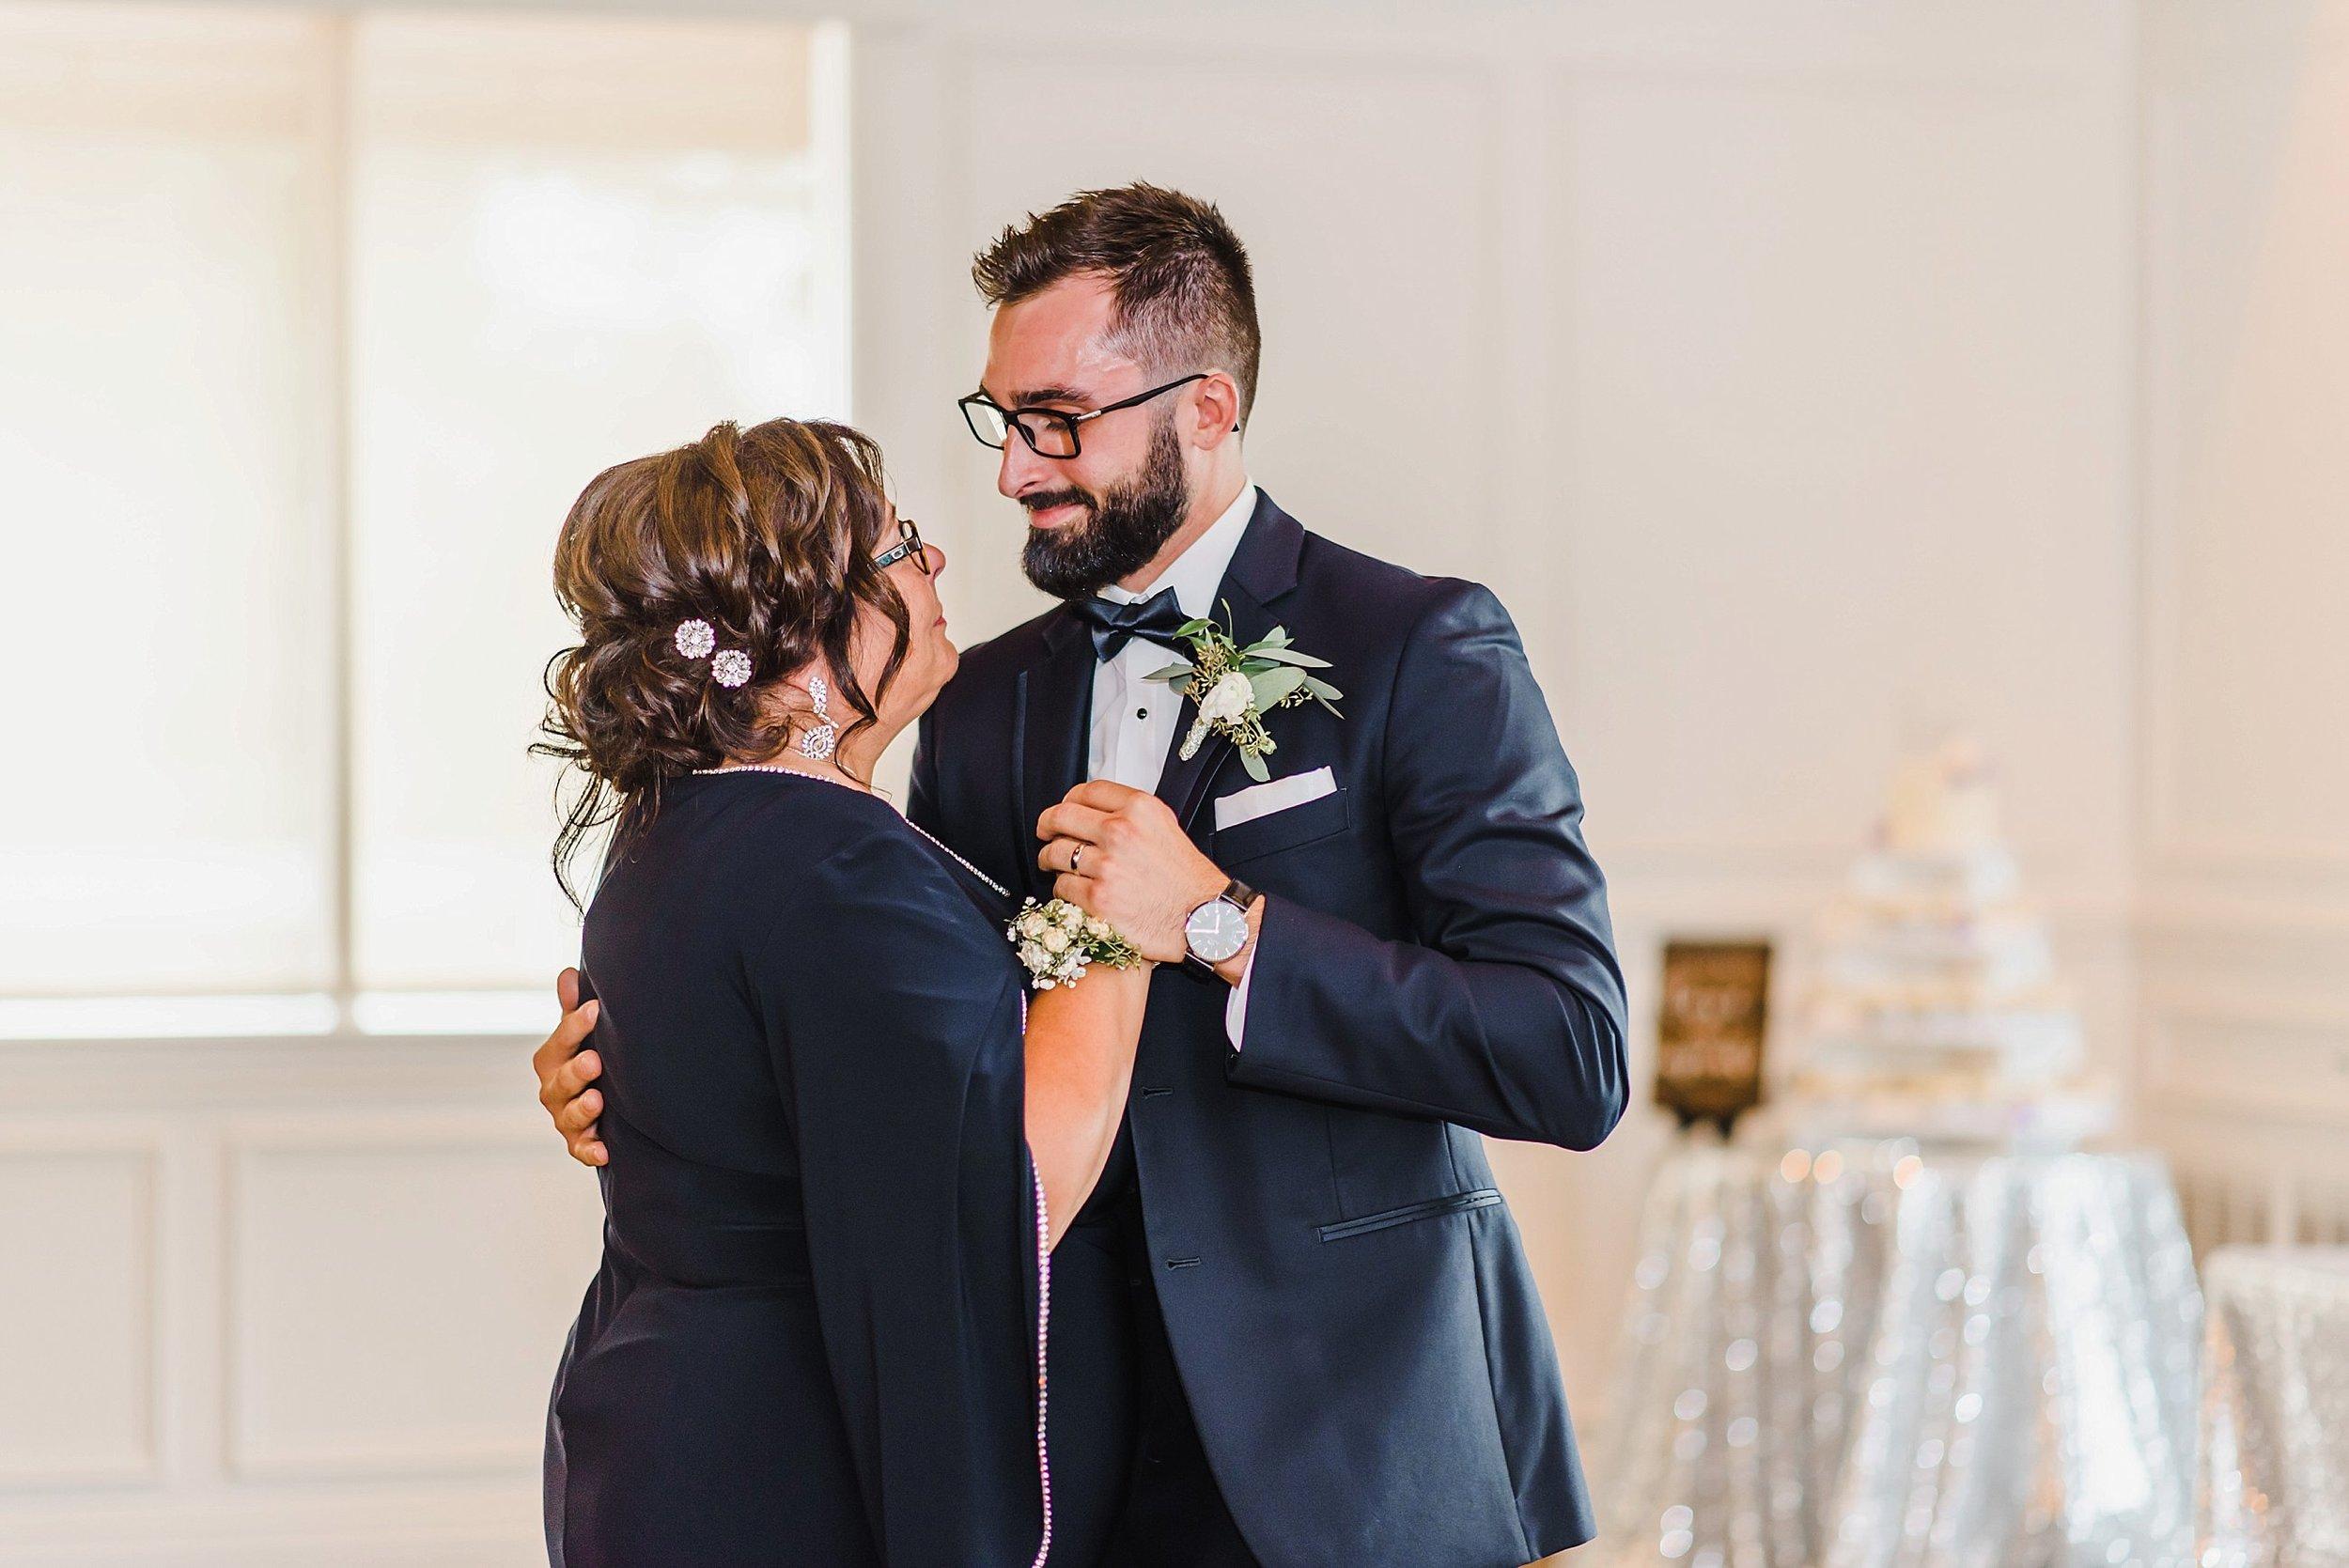 light airy indie fine art ottawa wedding photographer | Ali and Batoul Photography_1336.jpg